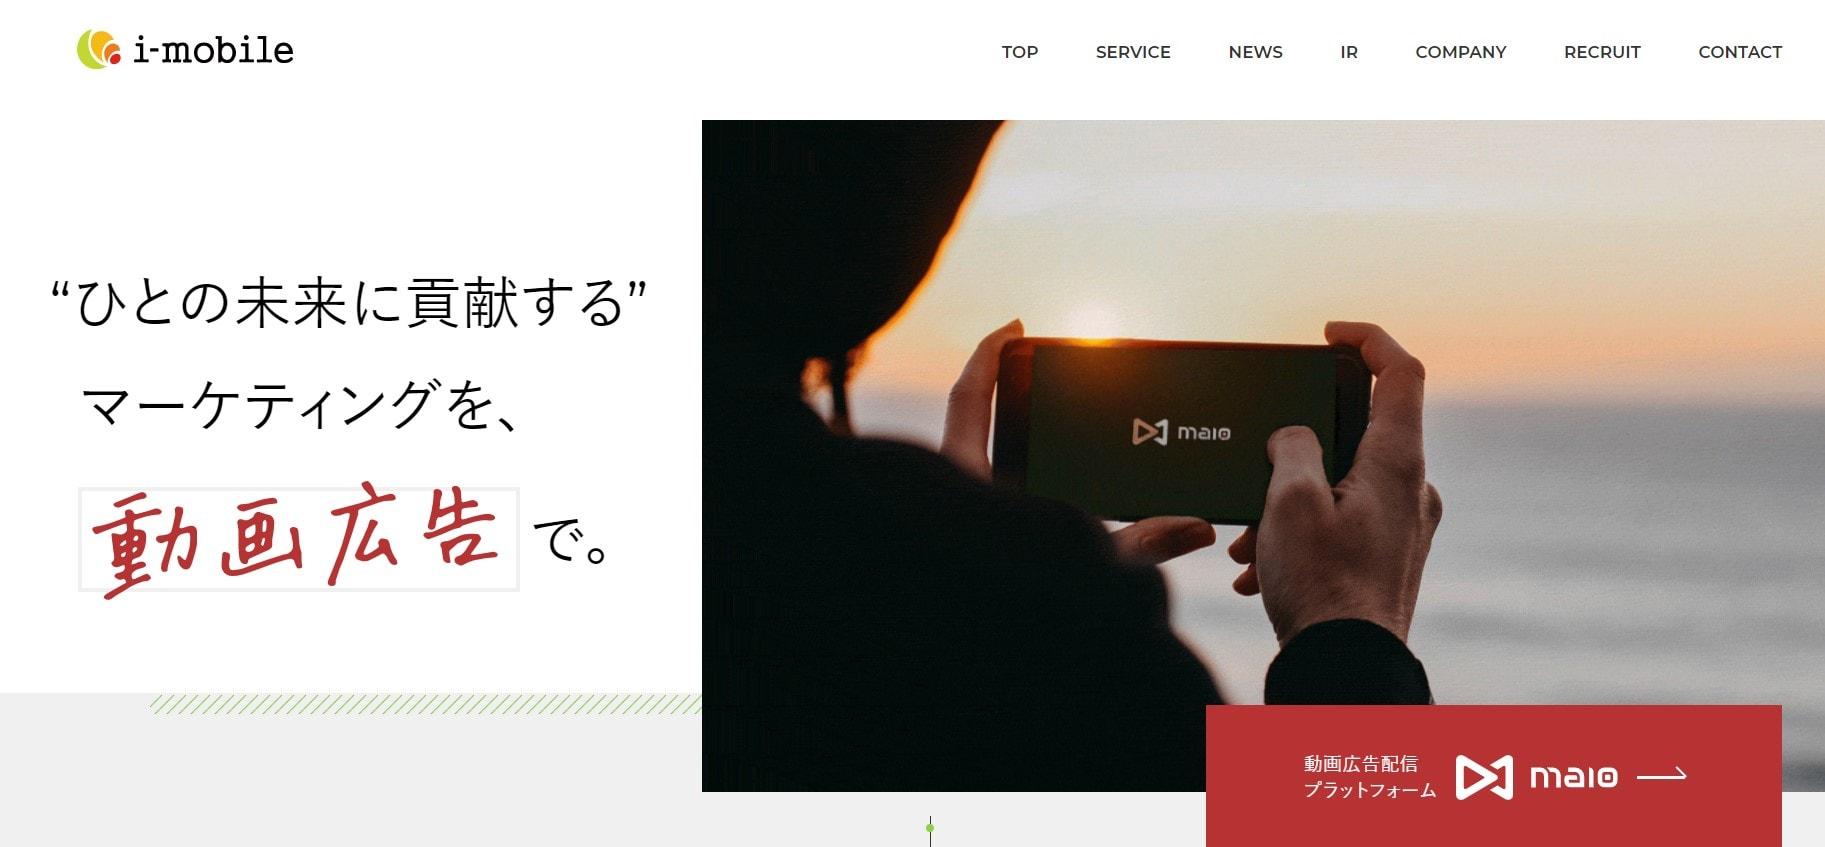 i-mobile(アイモバイル)